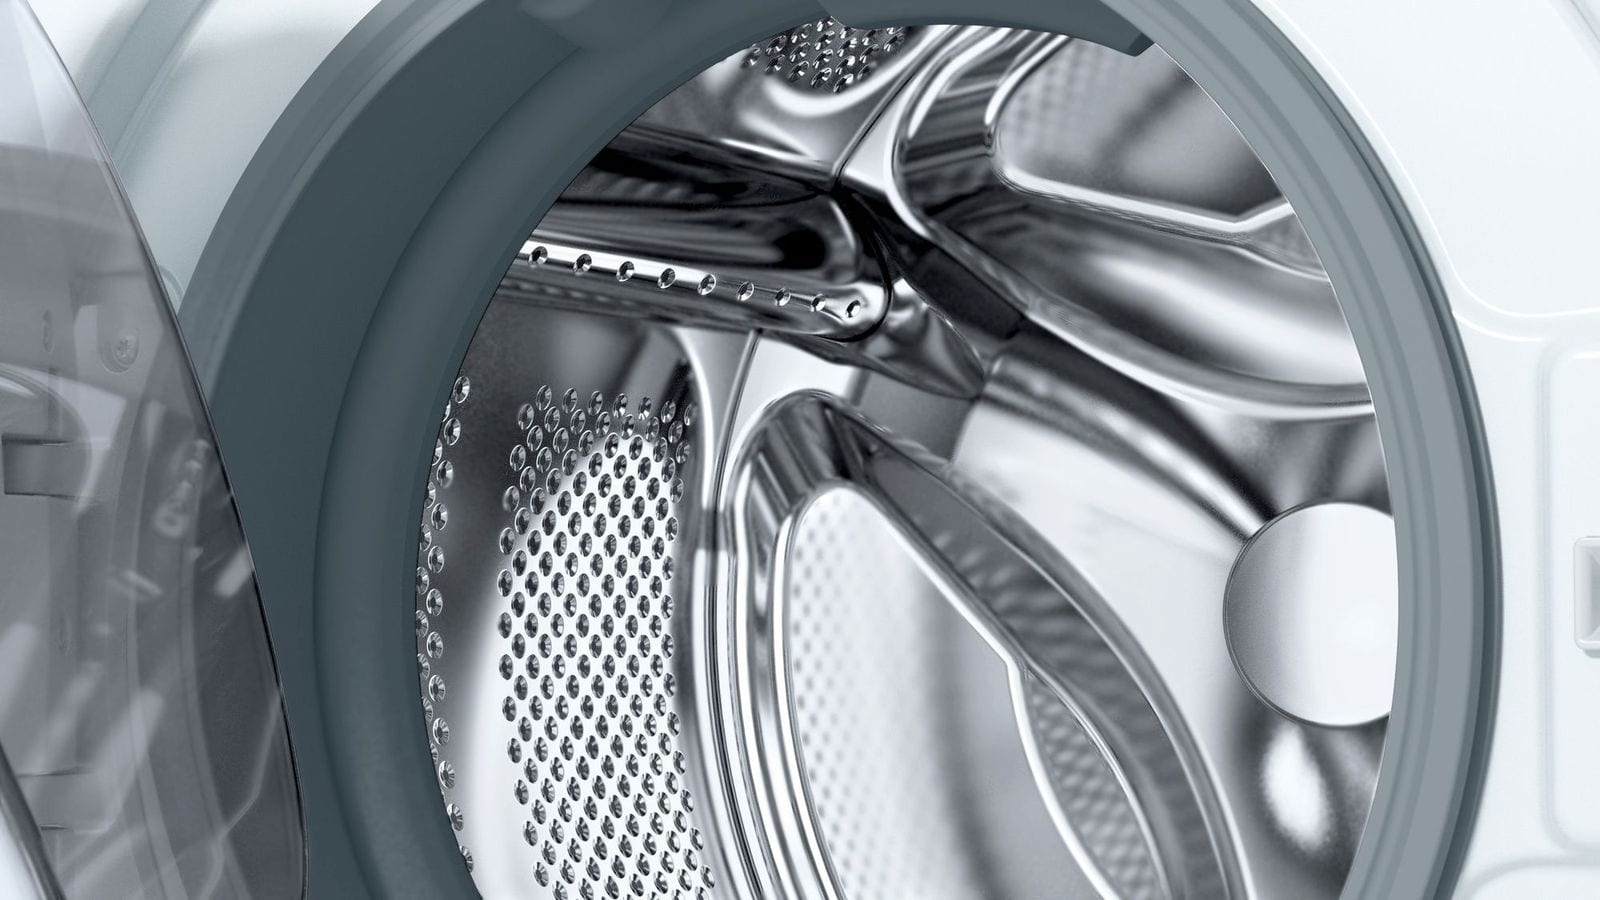 CDA CI921 White Integrated Built In 7kg 8 Programme Sensor Timed Tumble Dryer